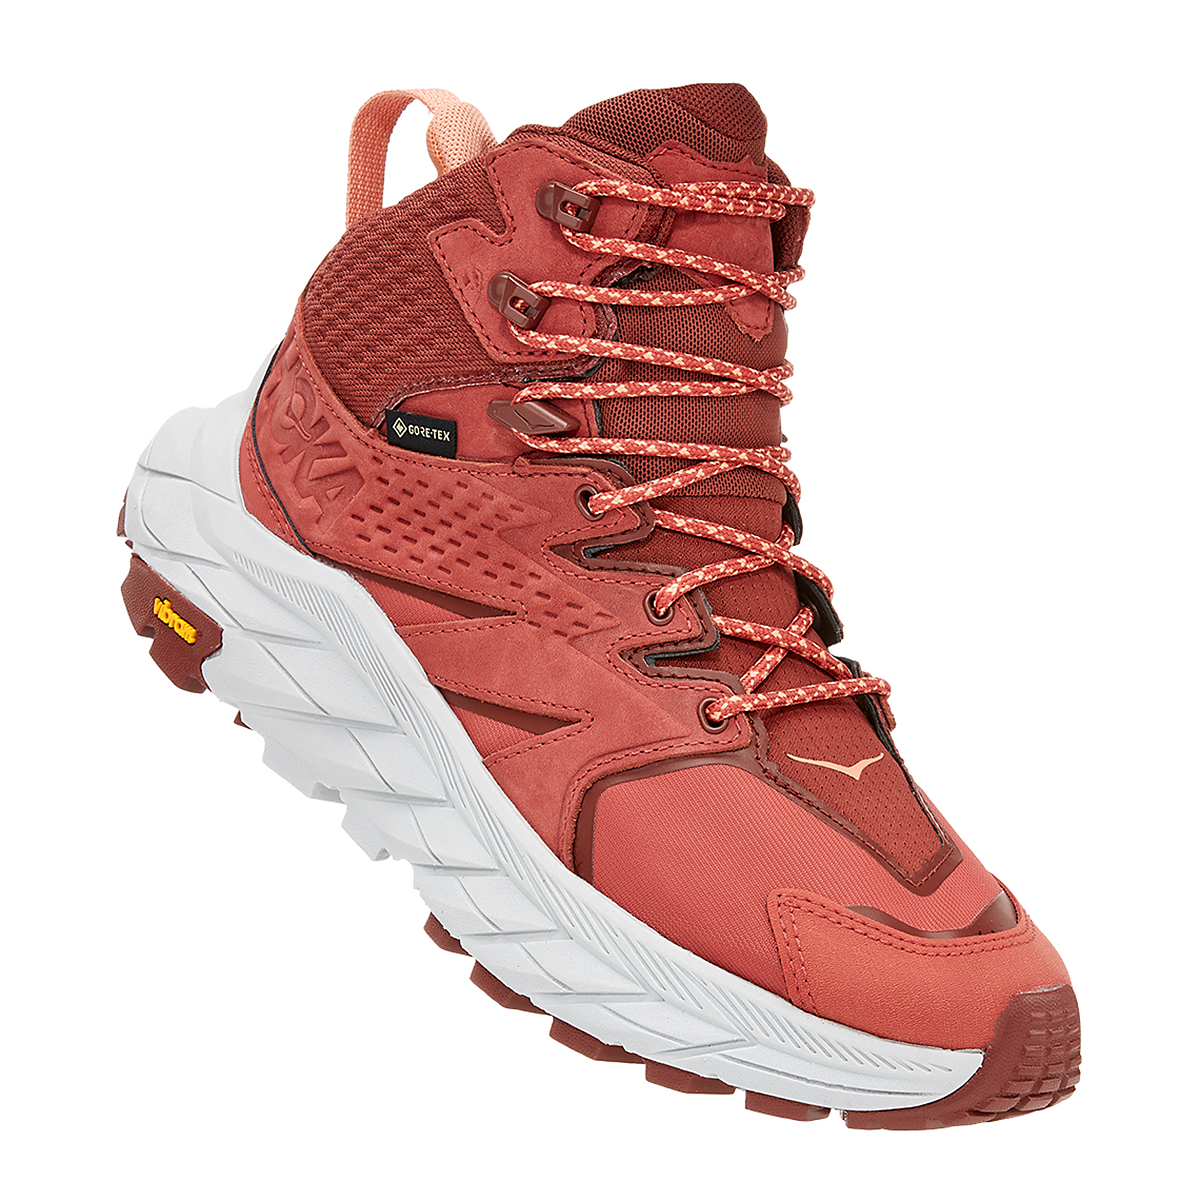 Women's Hoka One One Anacapa Mid Gore-Tex Trail Running Shoe - Color: Hot Sauce/Cherry Mahogany - Size: 5 - Width: Regular, Hot Sauce/Cherry Mahogany, large, image 2